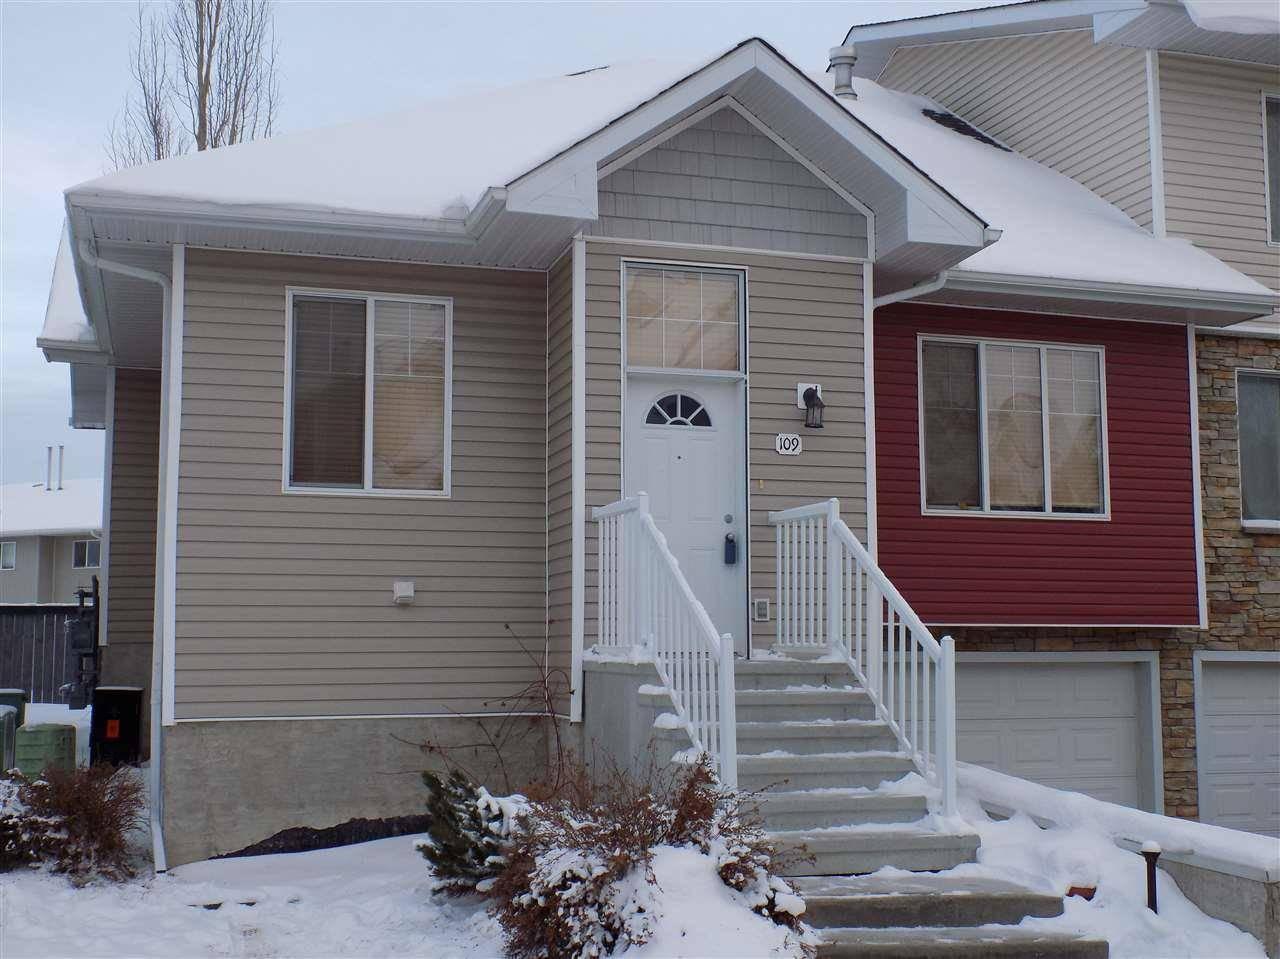 Townhouse for sale at 178 Bridgeport Blvd Unit 109 Leduc Alberta - MLS: E4184212